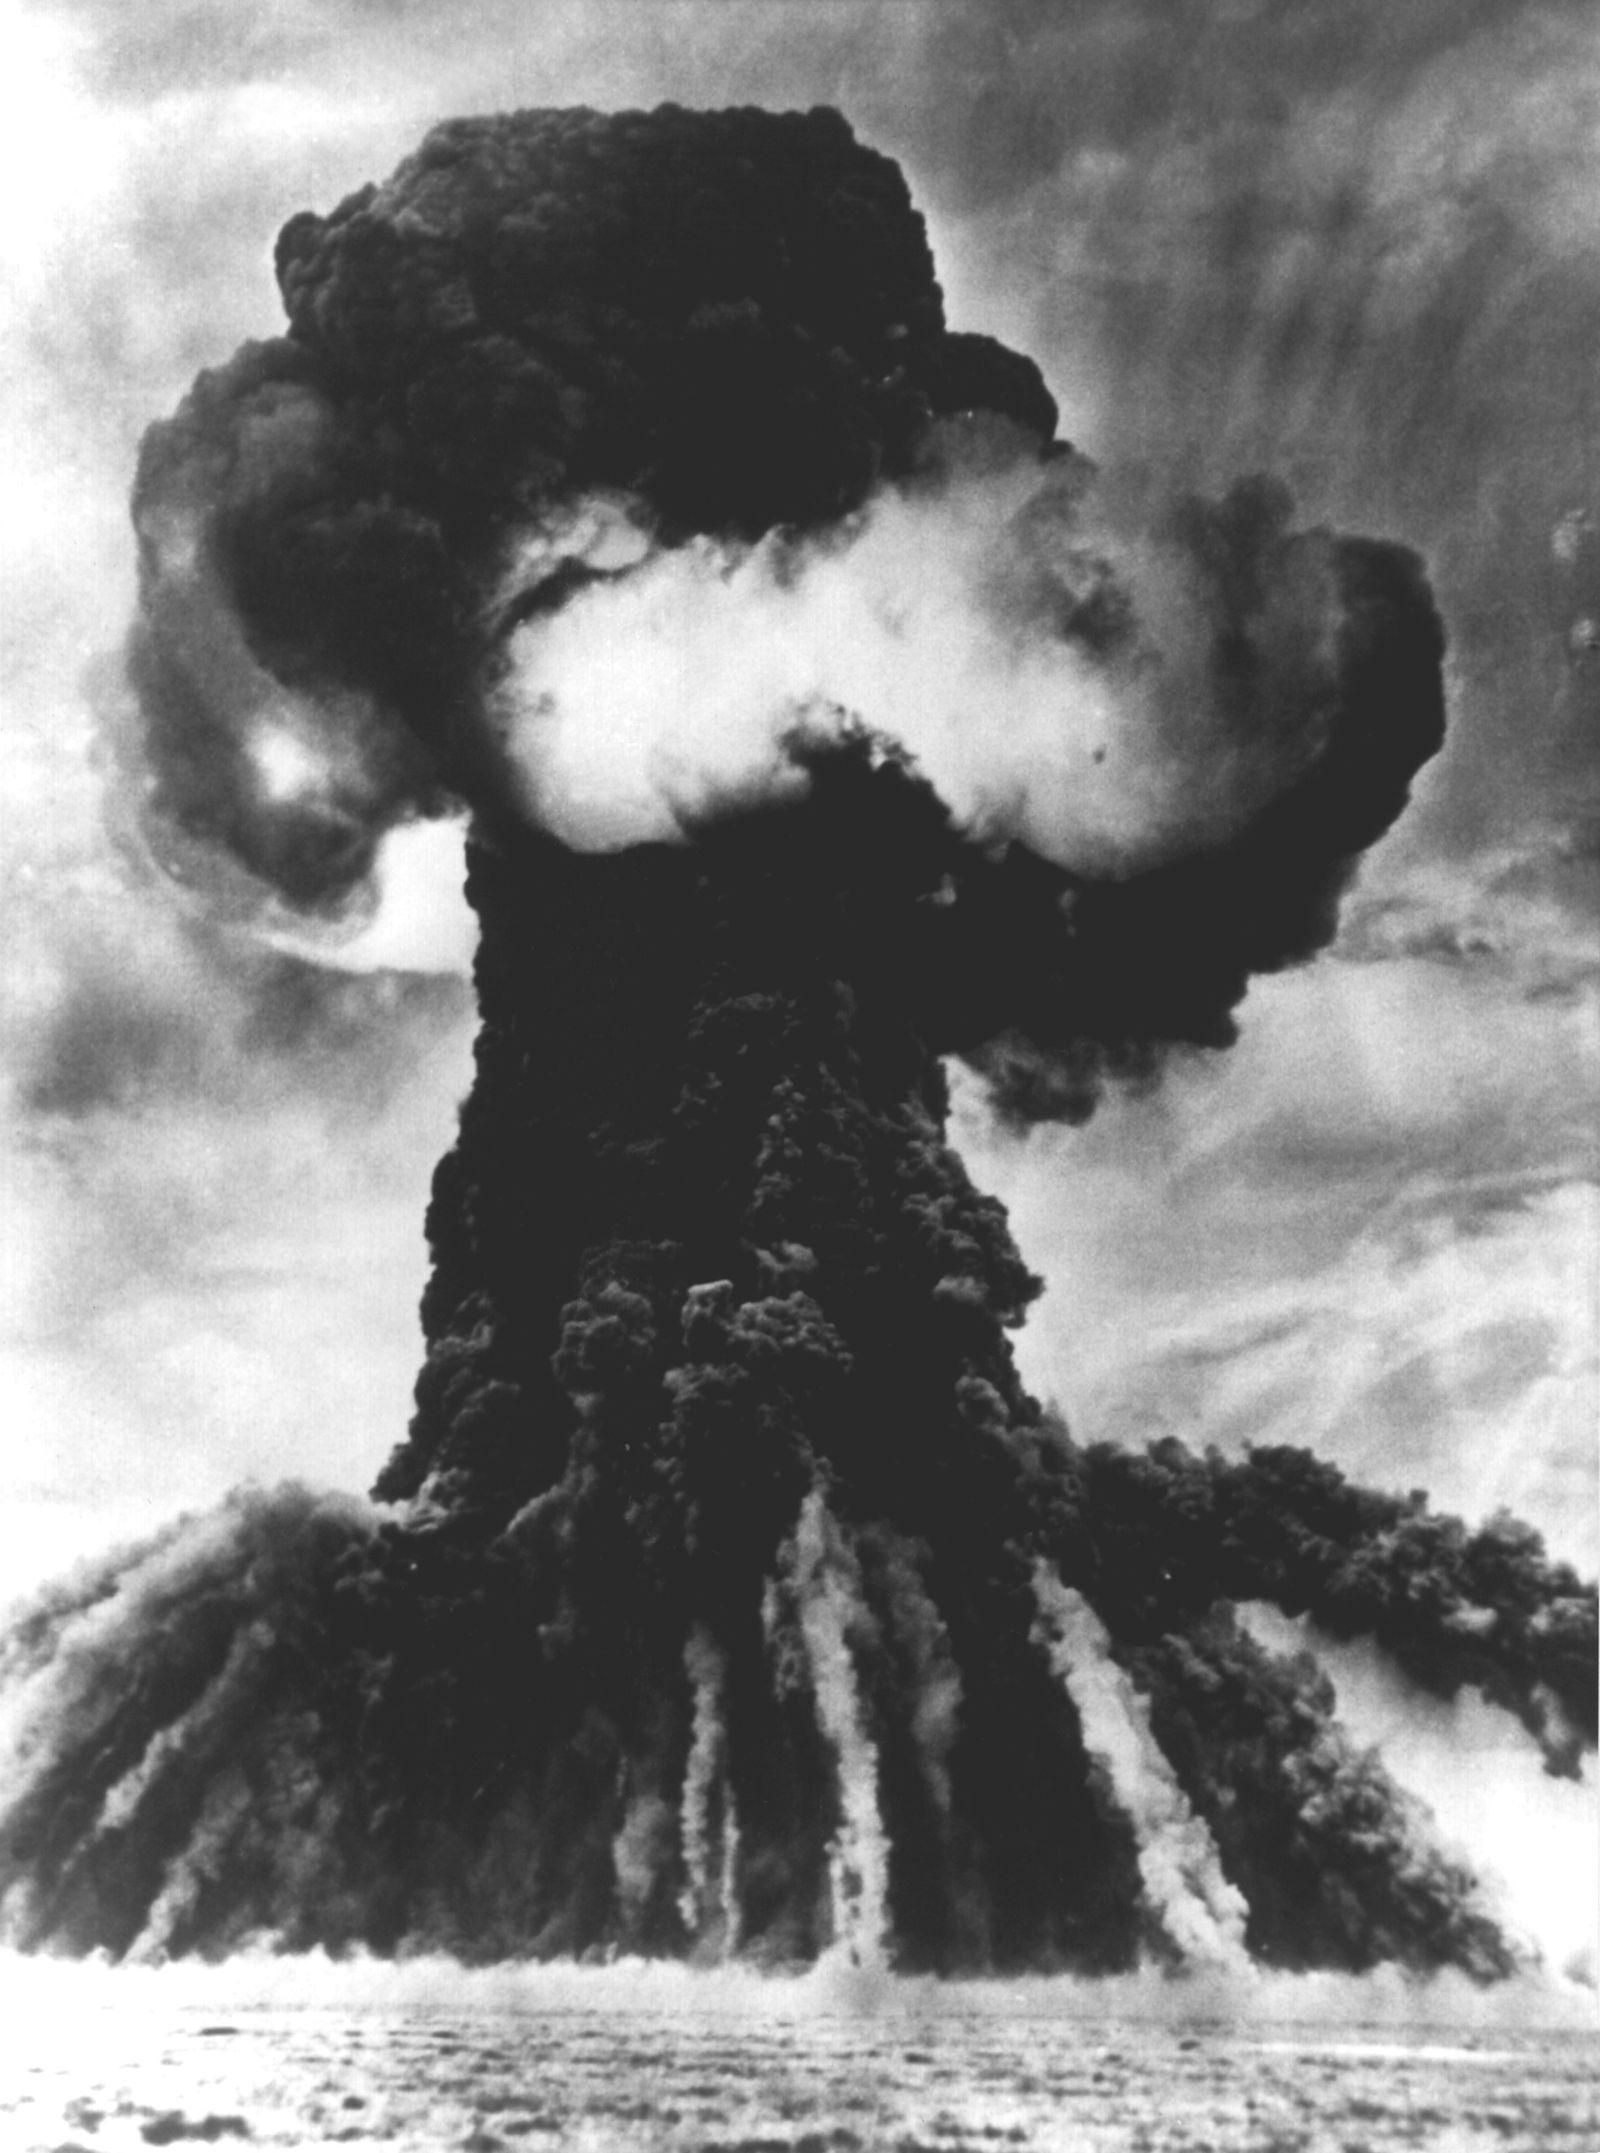 Atomtest/Semipalatinsk/Sowjetunion